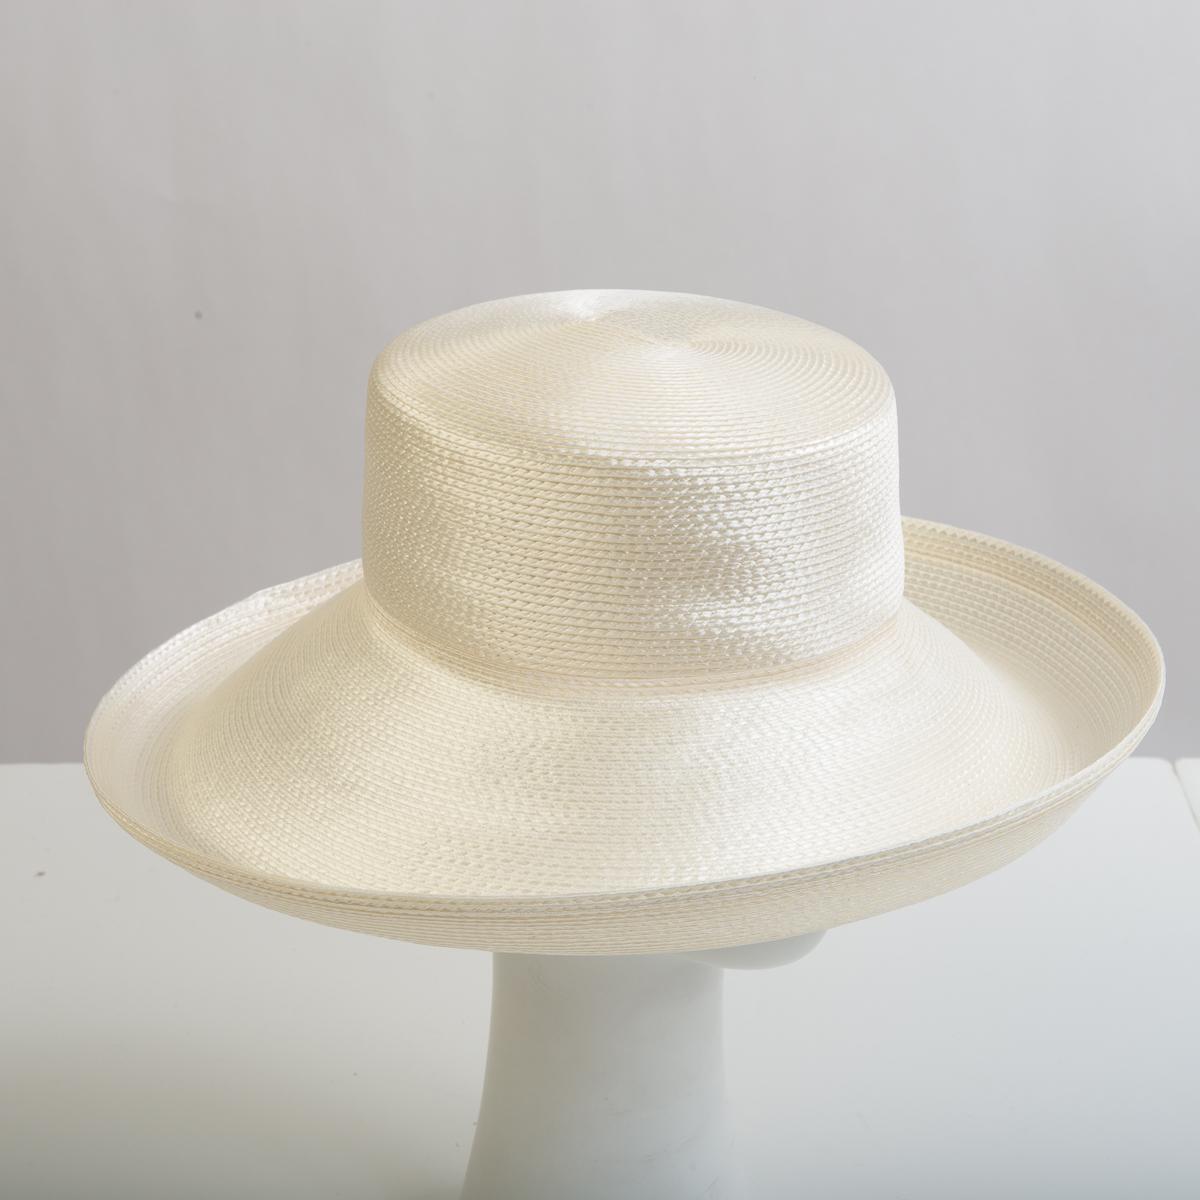 d244410c9ce288 Ivory Polypropylene Straw Wide Brim Plain Hats-FR01R-0-25- Sun Yorkos |  Zoria